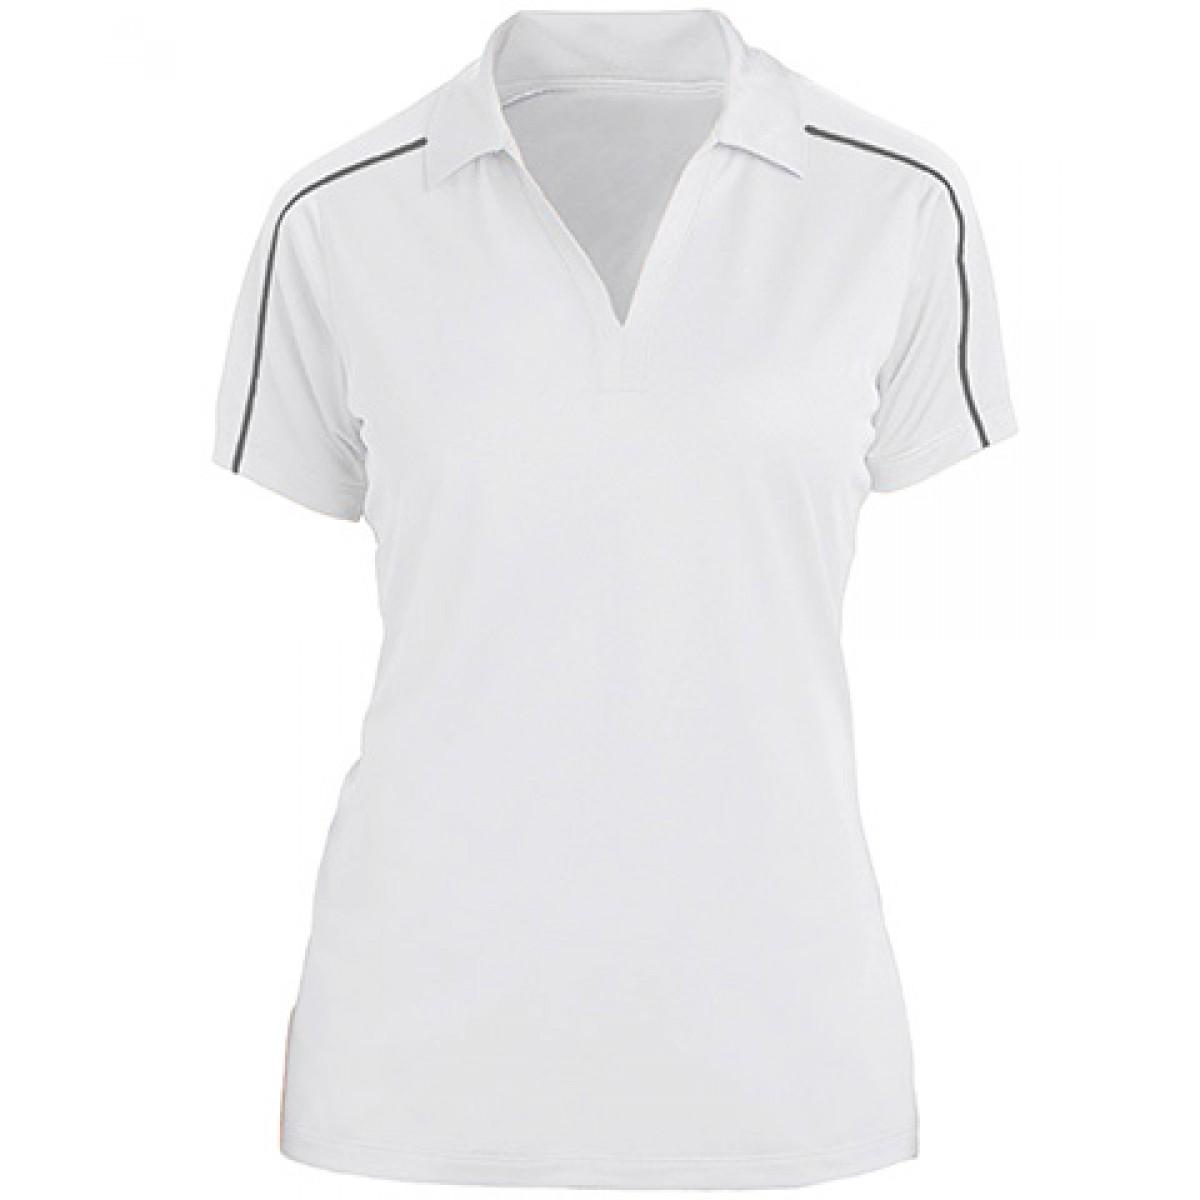 Sport-Tek Womens Piped Short Sleeve Polo -White-3XL